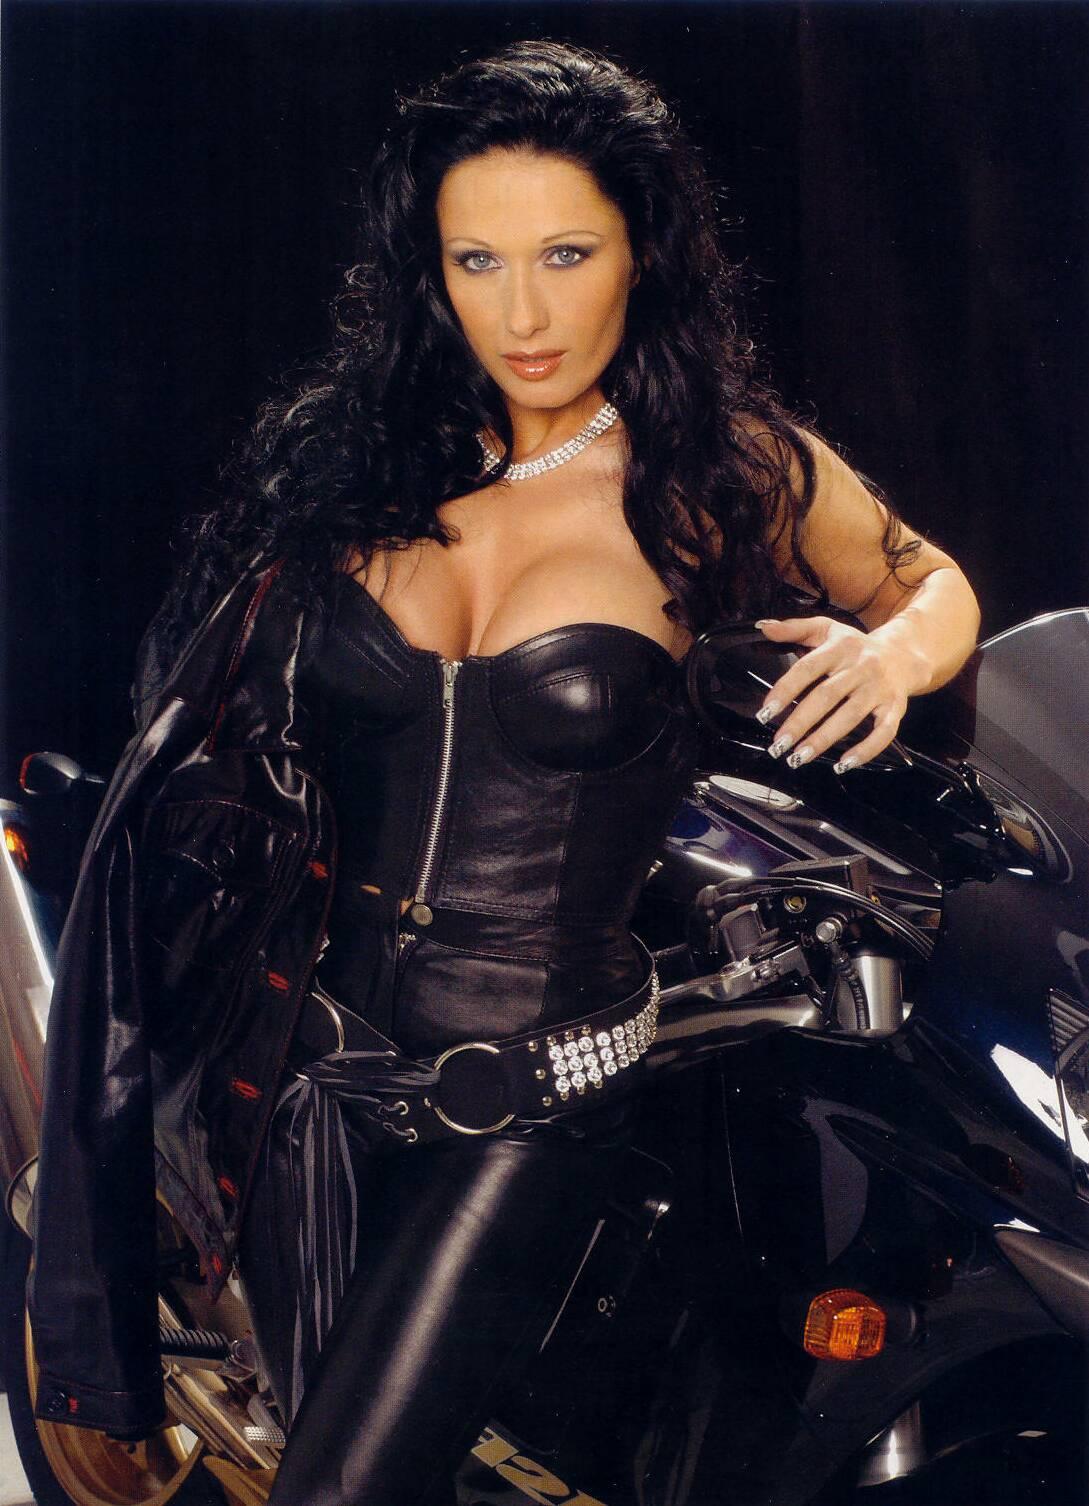 Erika Bella motorbike 3.jpg